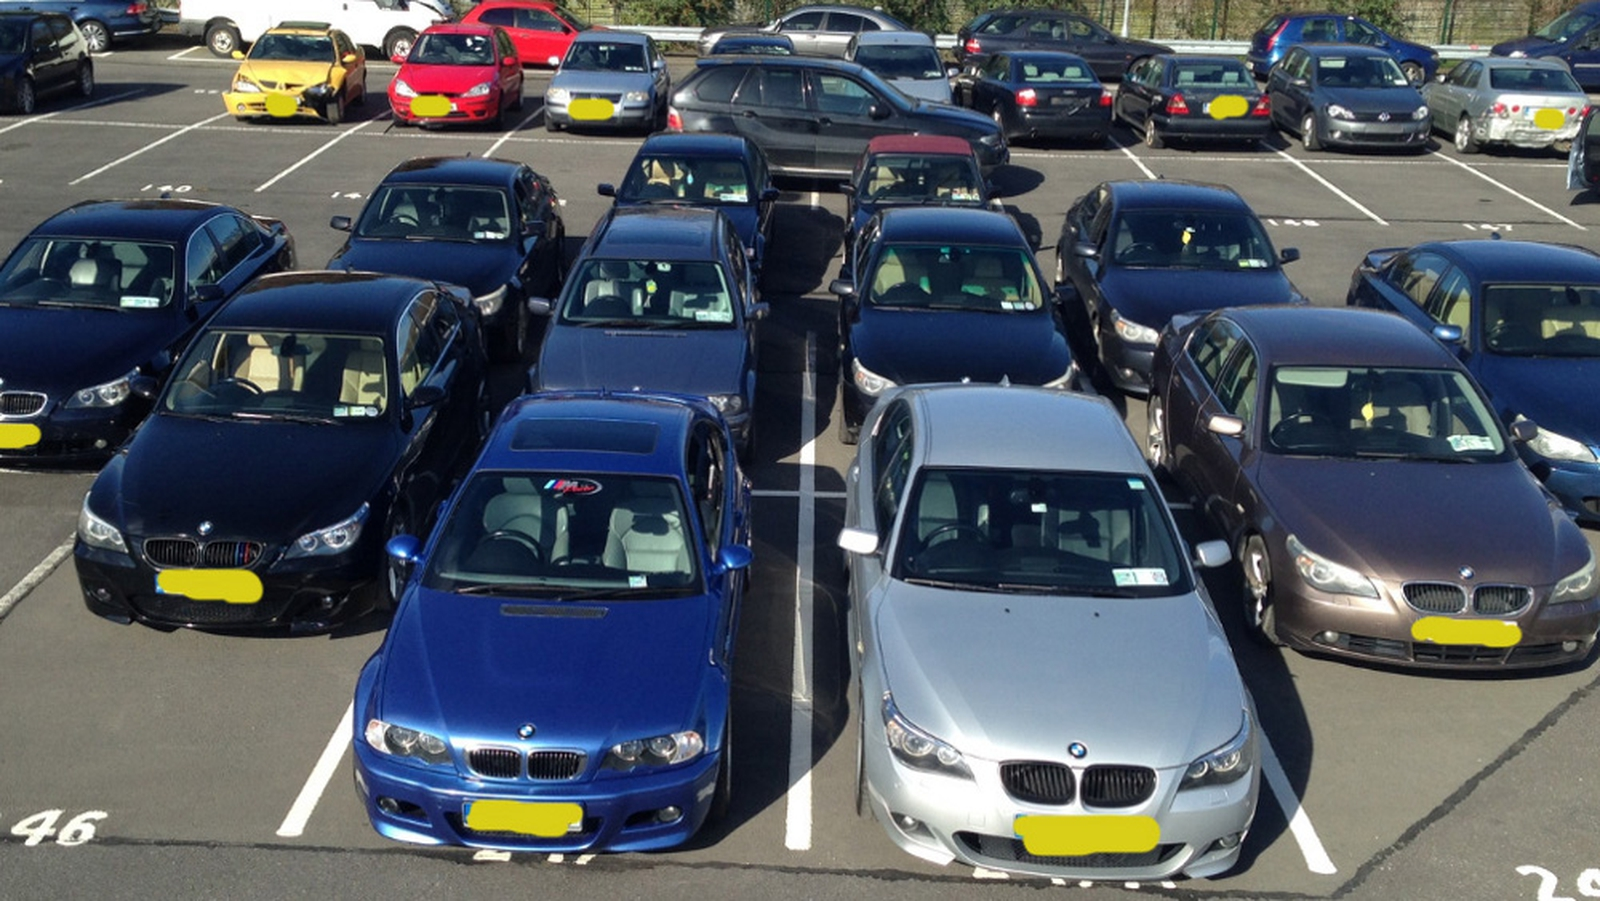 Gardaí discover luxury car fraud worth over €2m